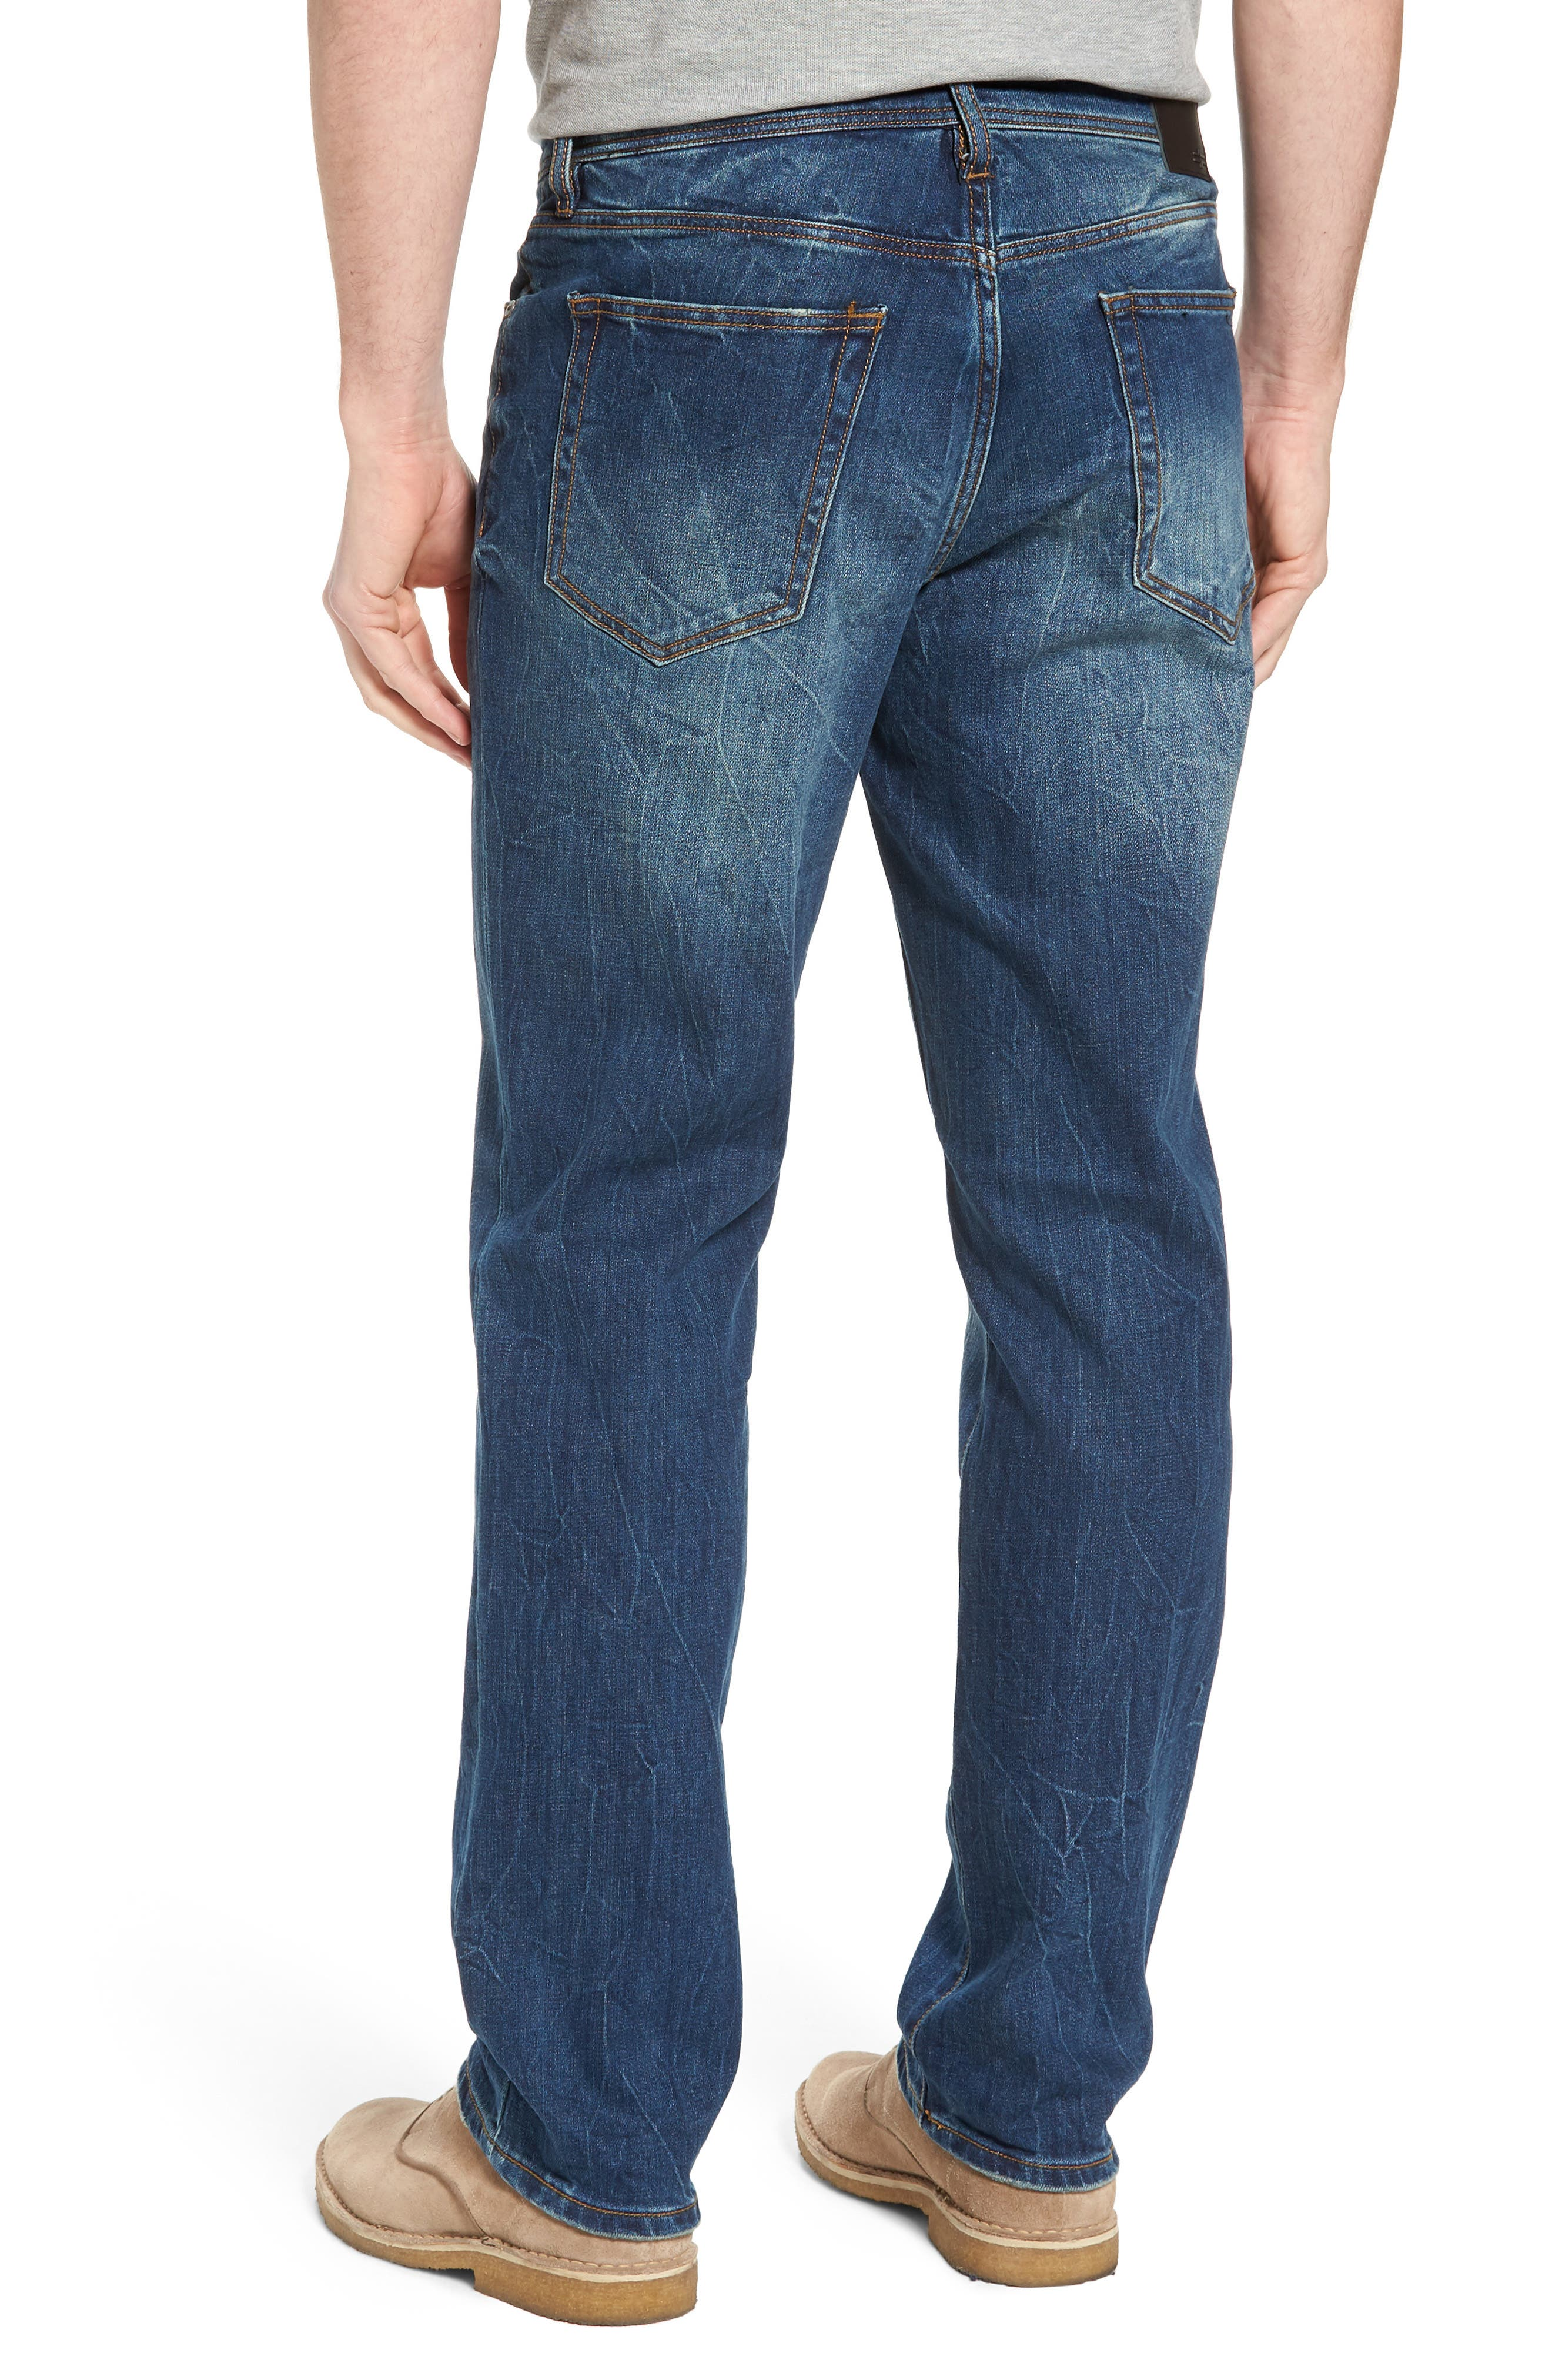 Jeans Co. Regent Relaxed Fit Jeans,                             Alternate thumbnail 2, color,                             Odessa Vintage Medium